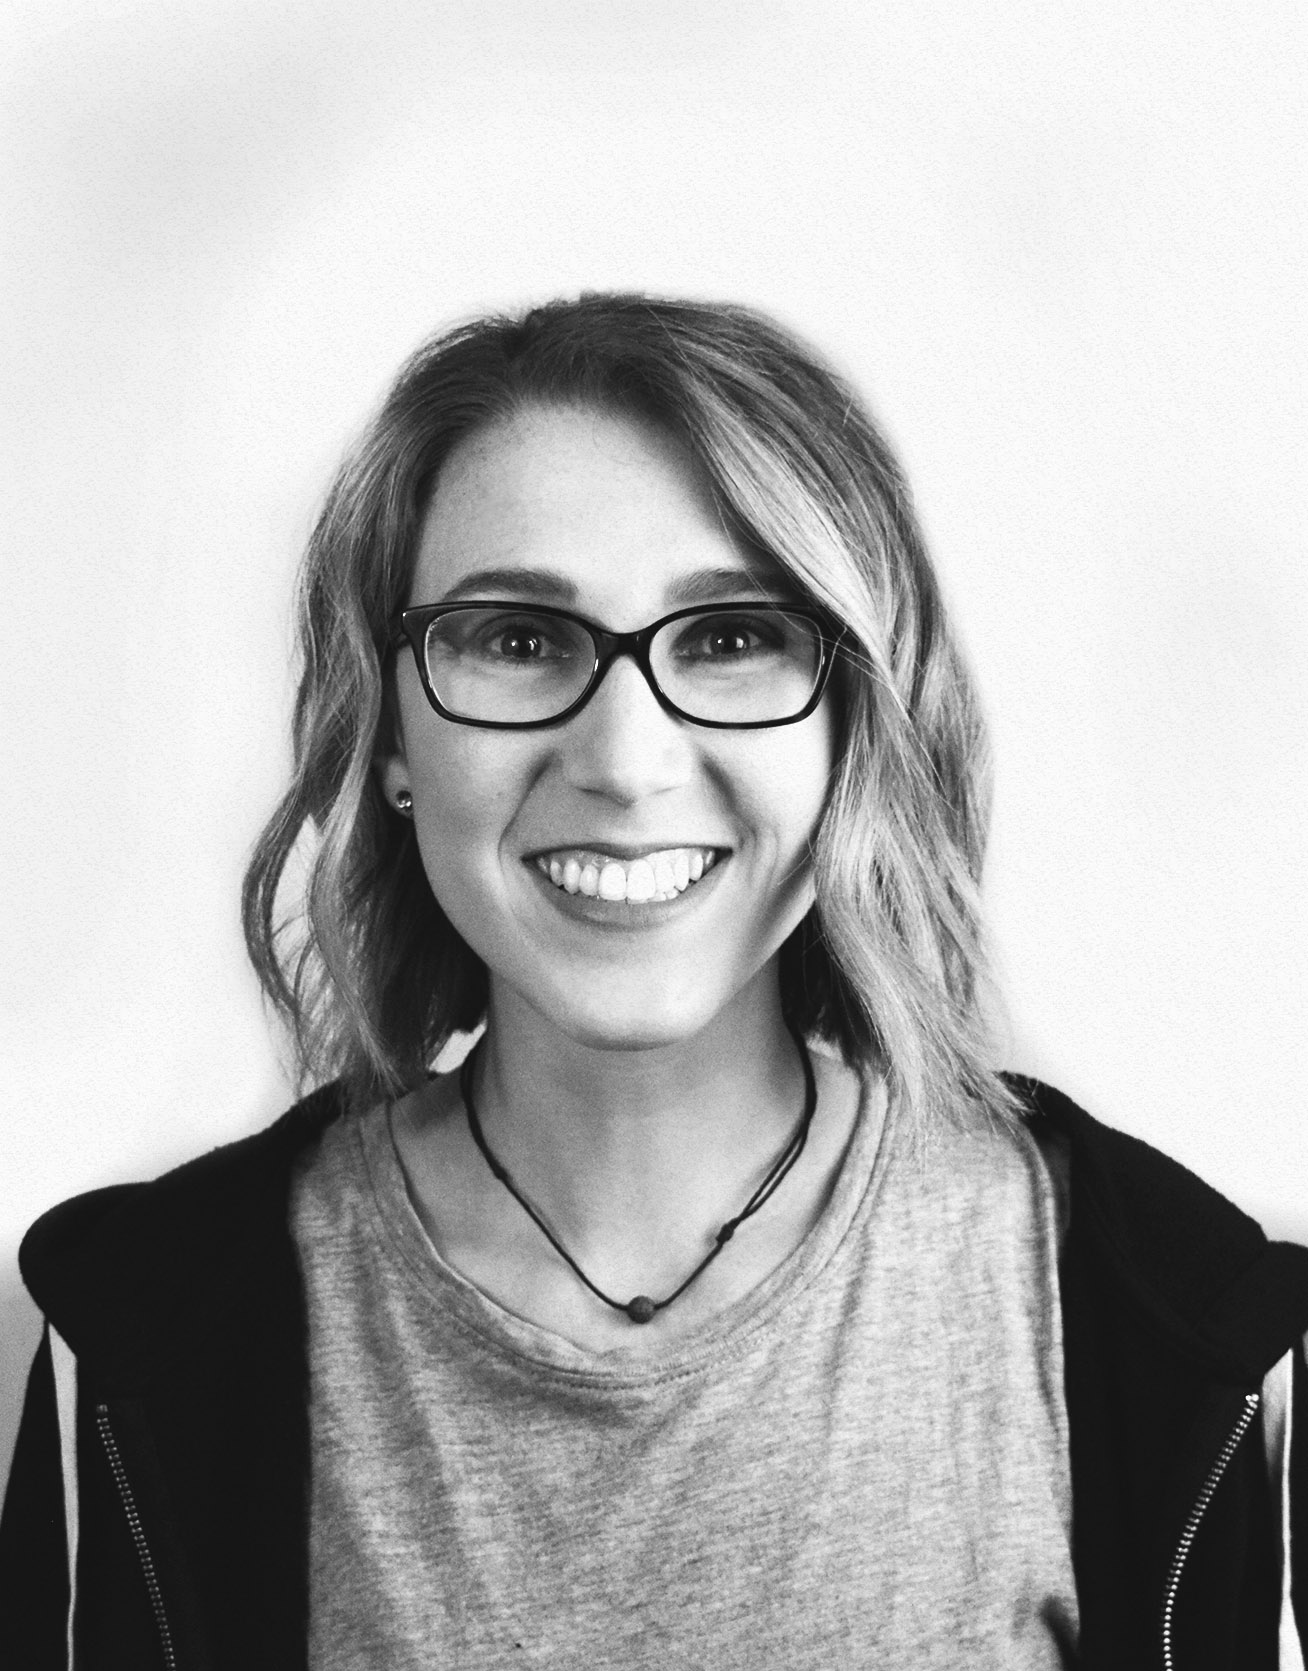 Katie Jackson - Children's Ministry Assistant